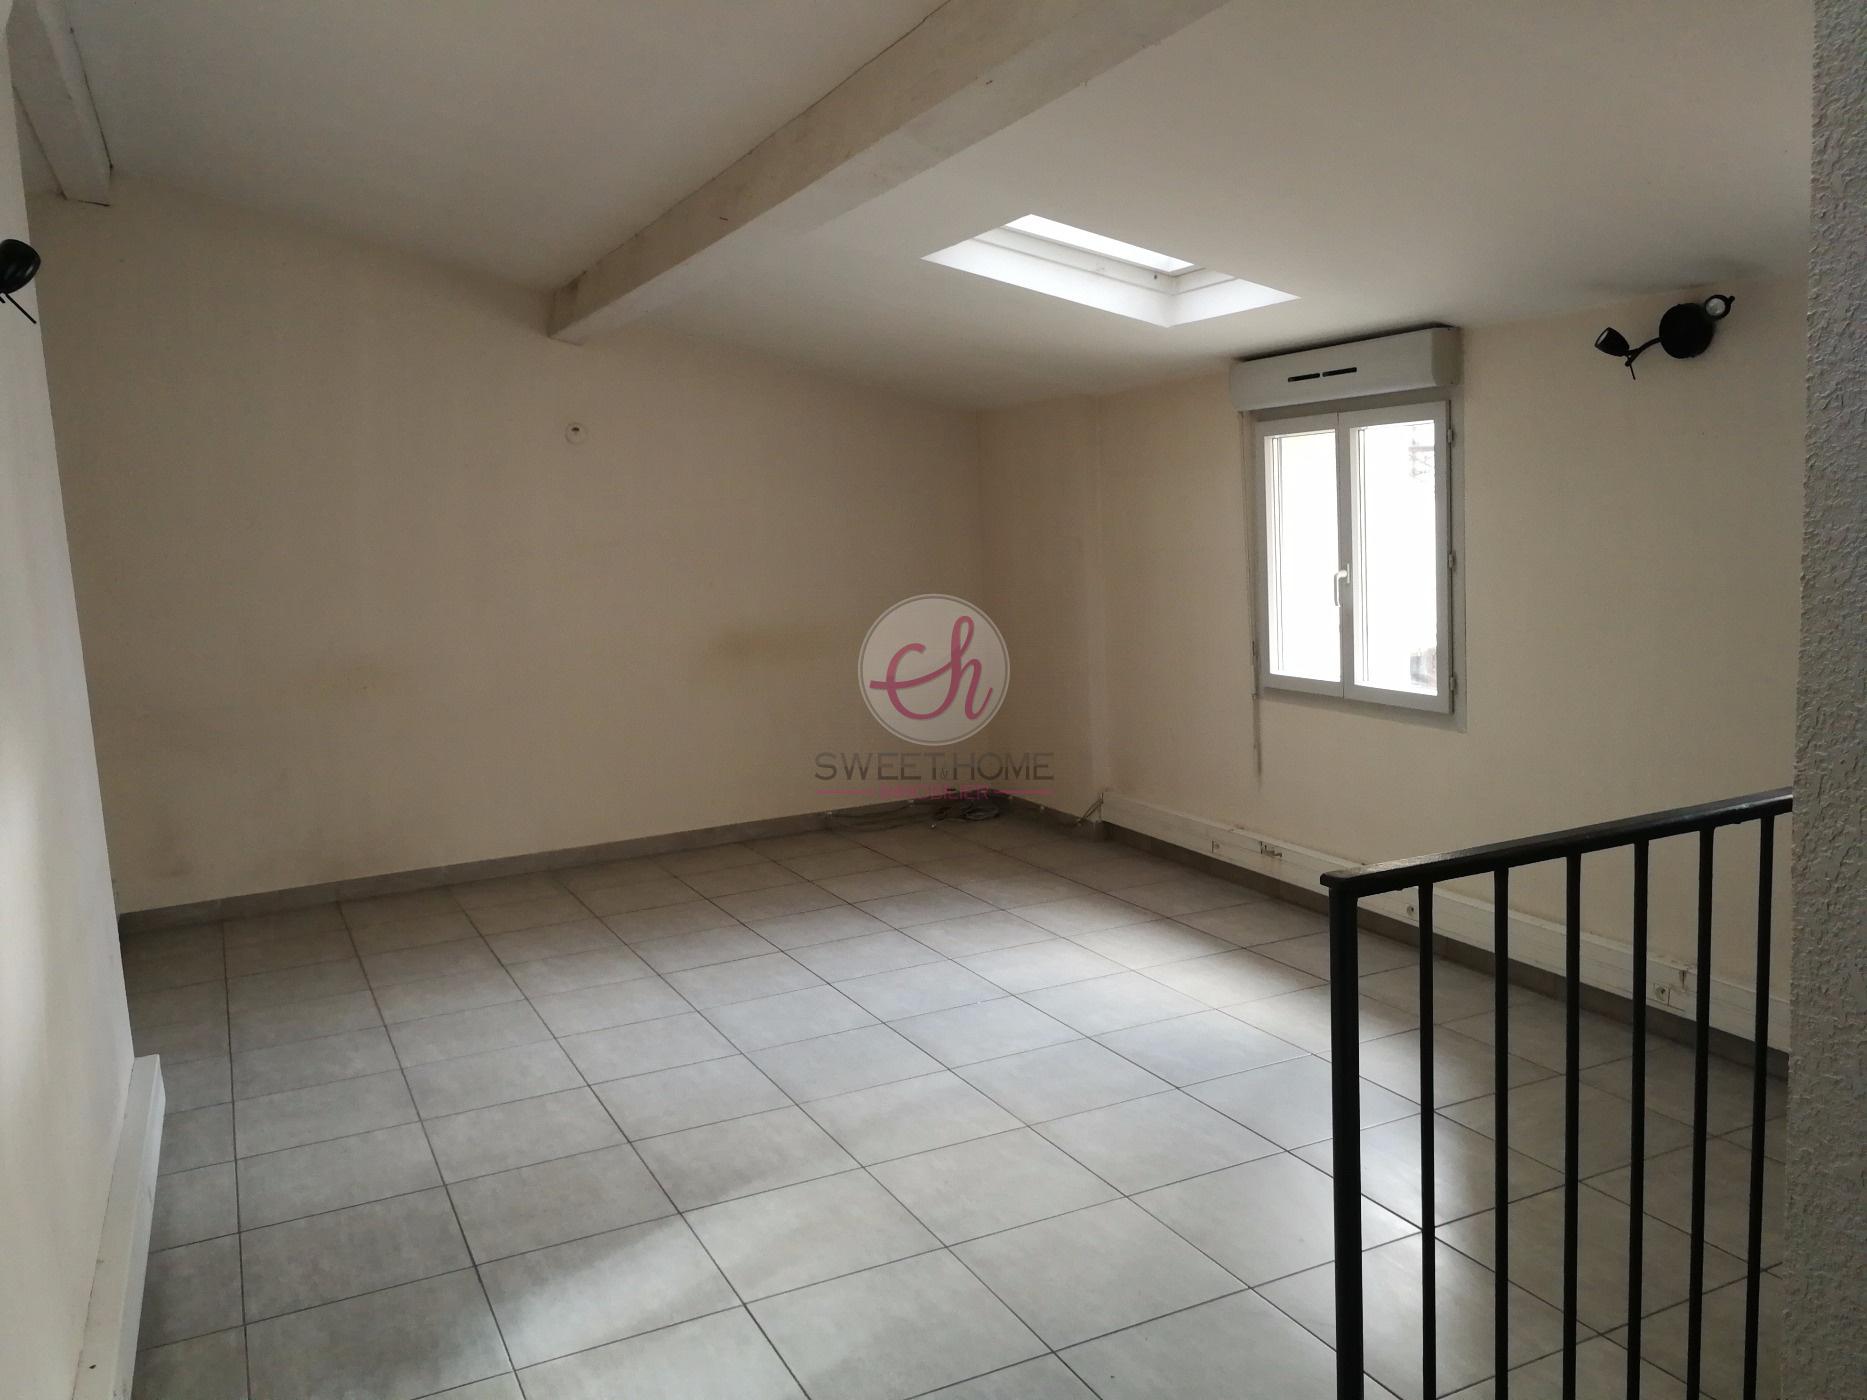 Location immobilier professionnel bureau m² zone franche